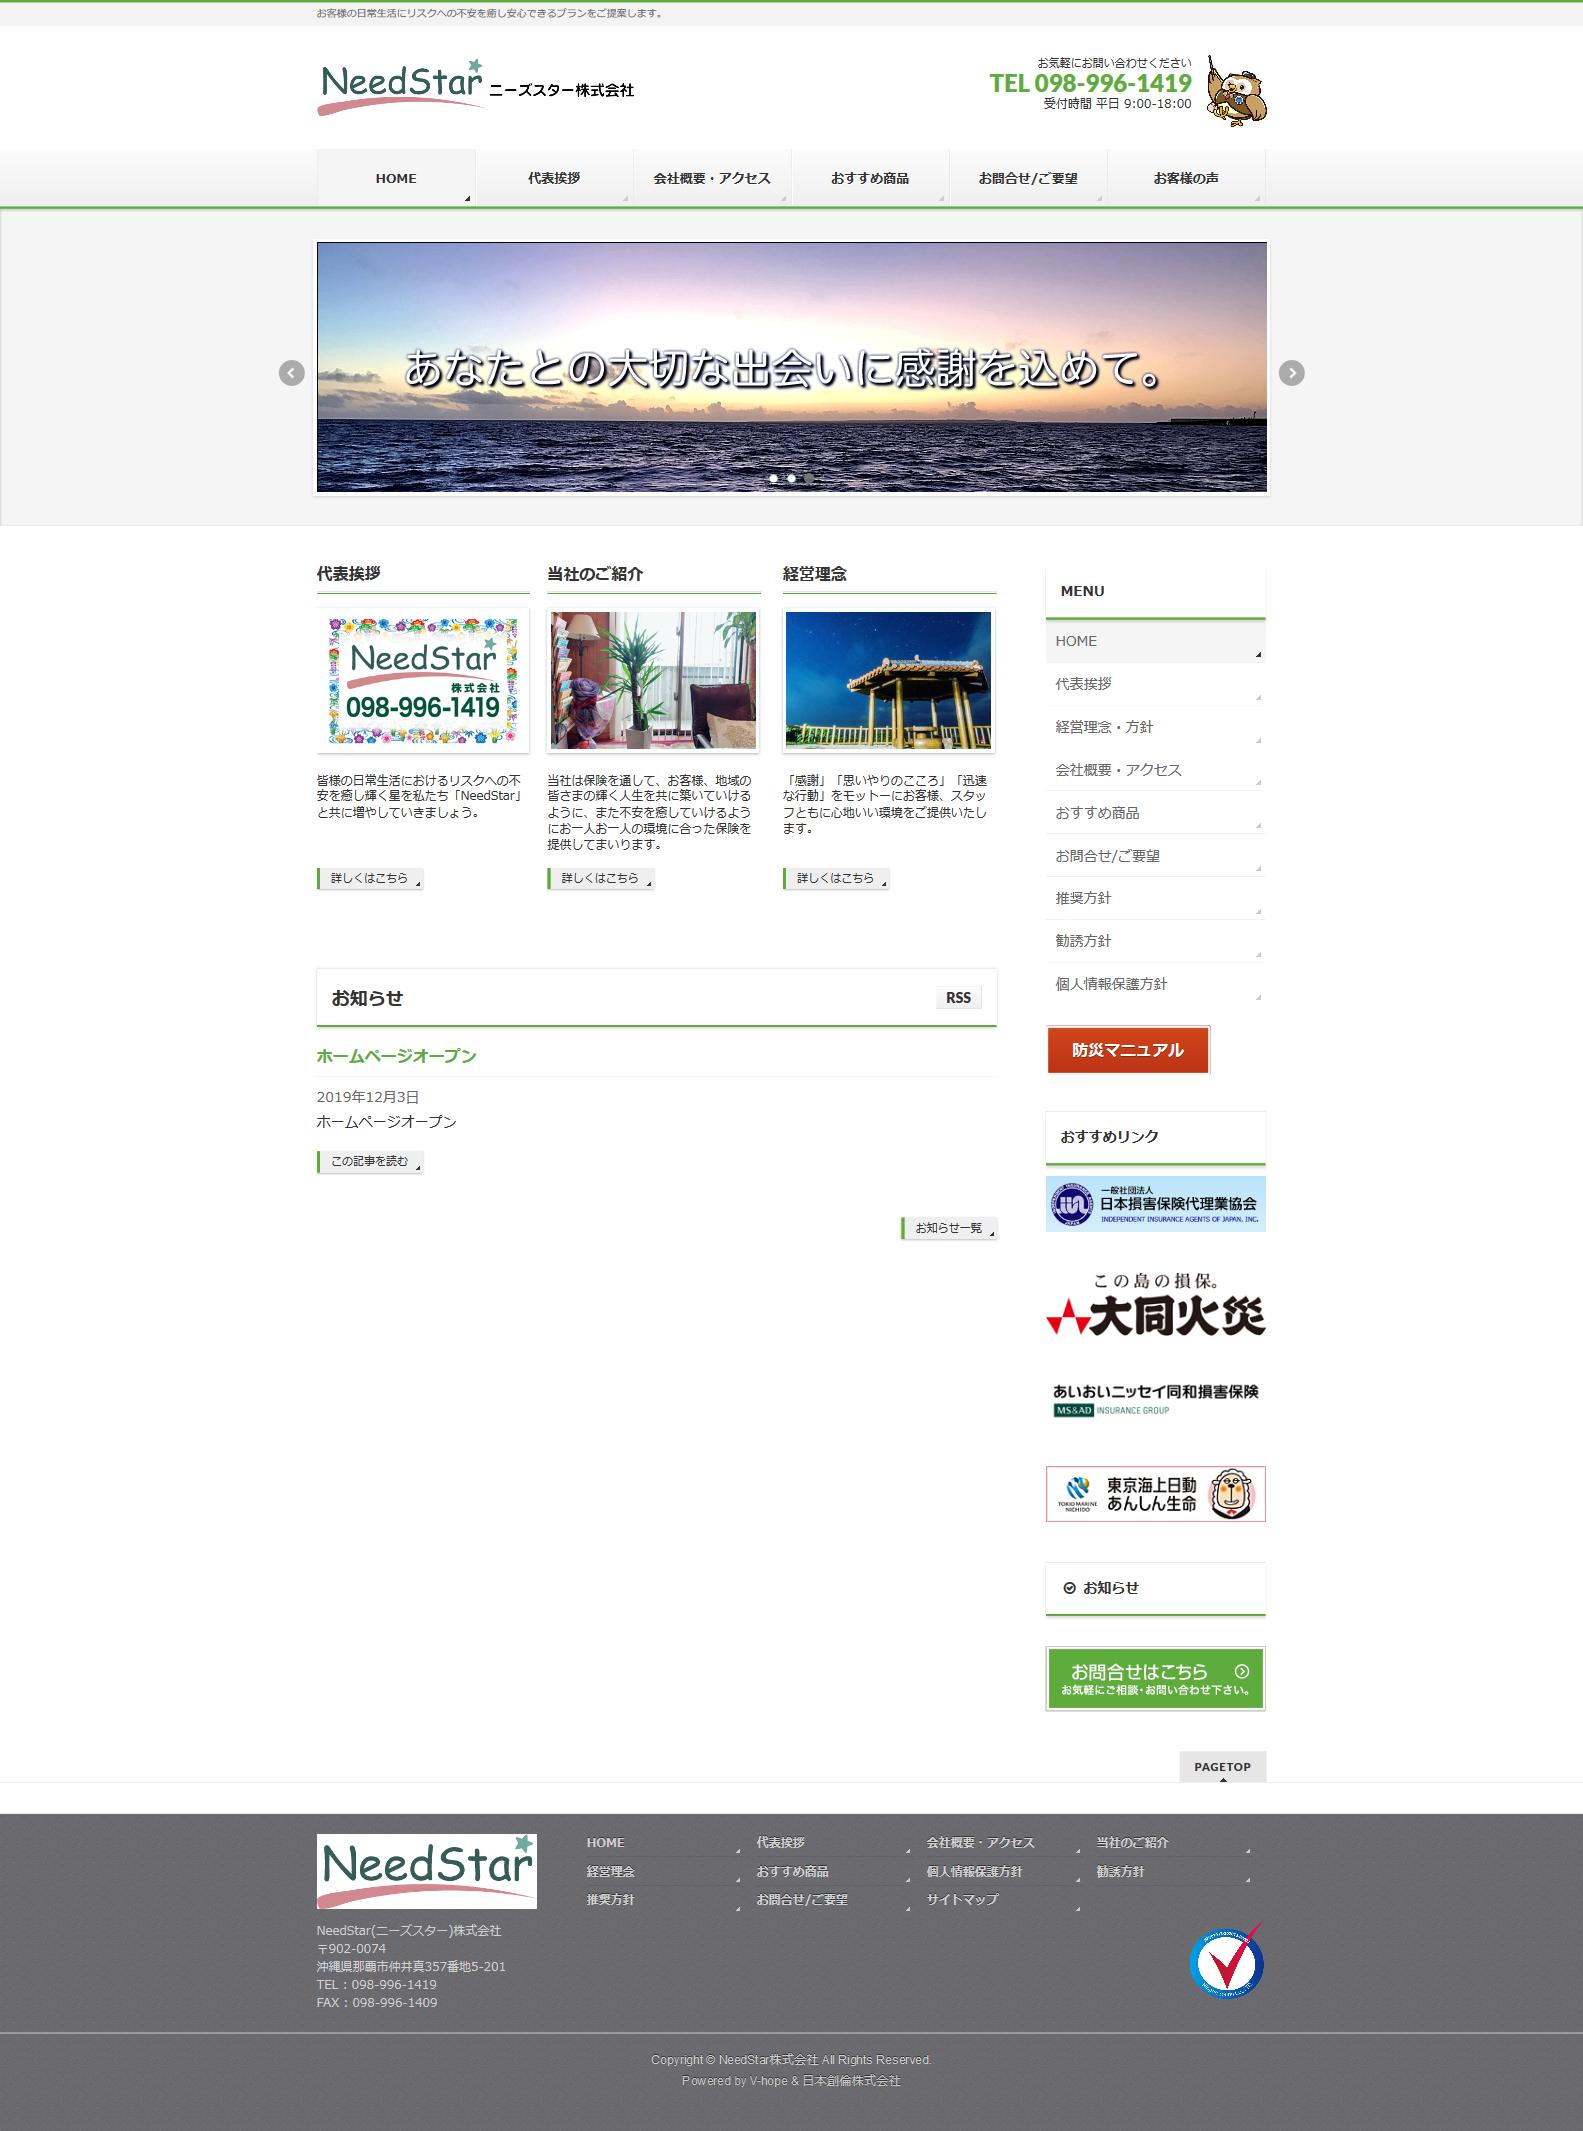 NeedStar(ニーズスター)株式会社 様